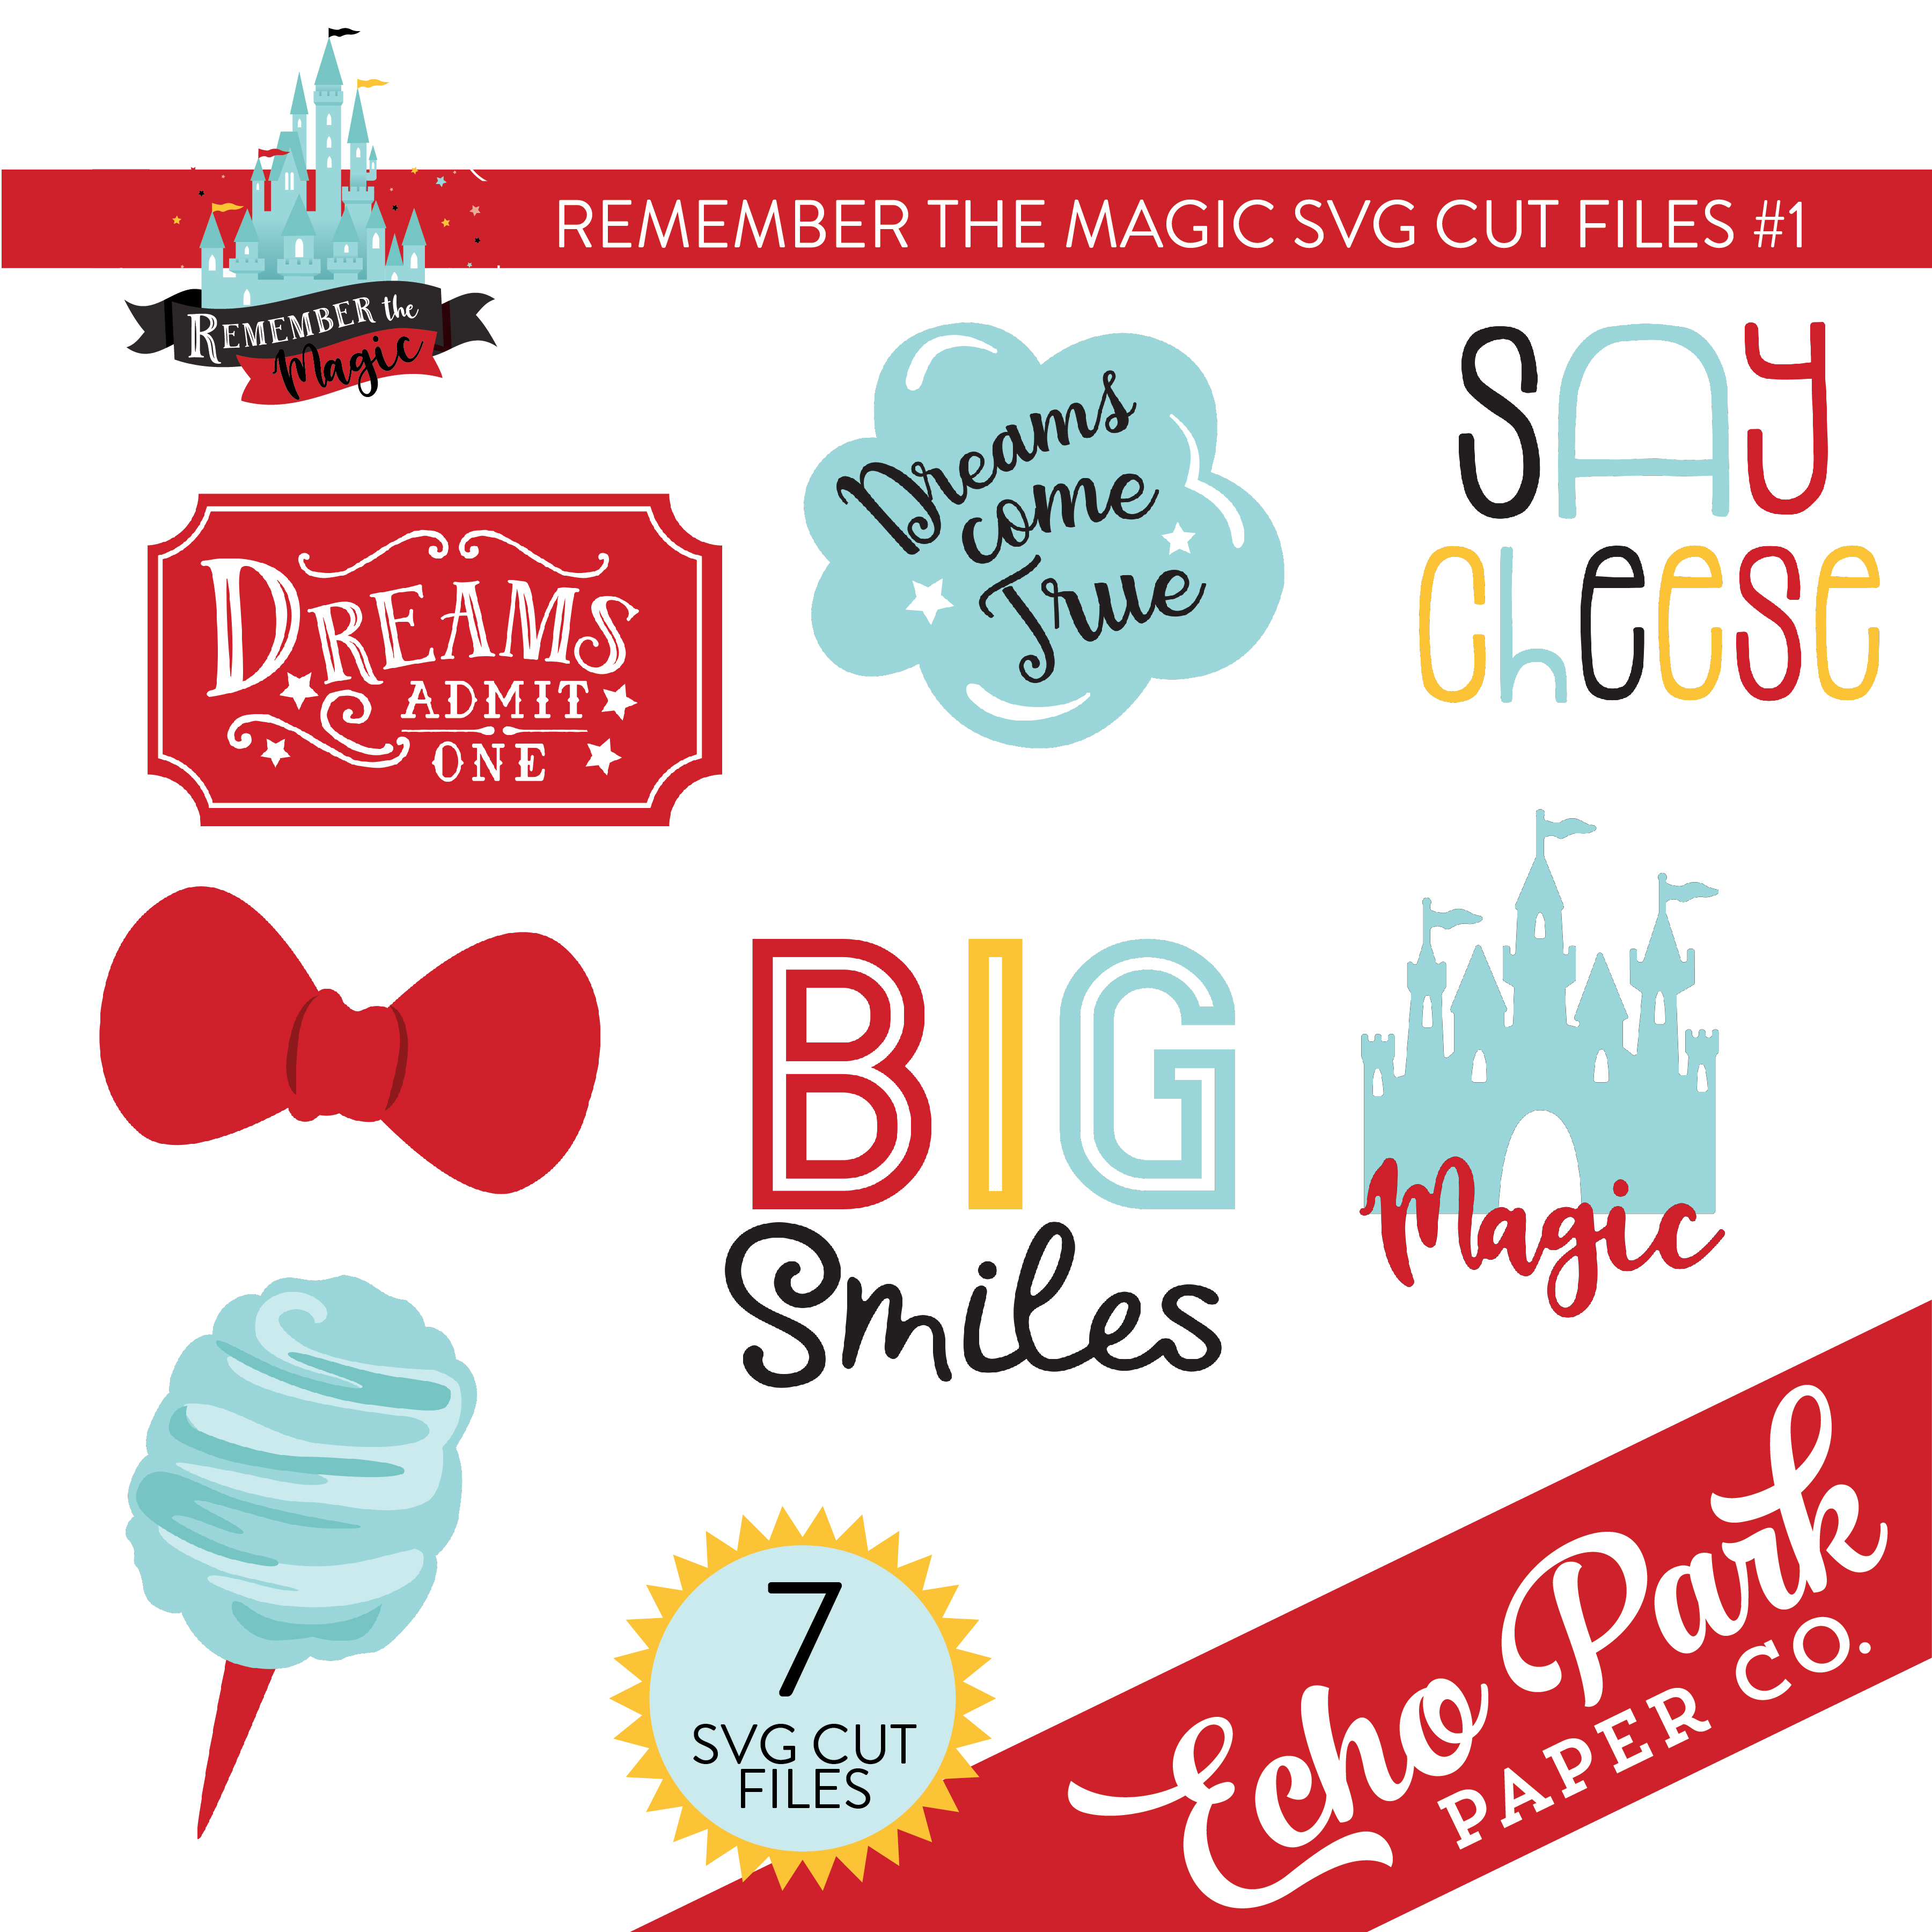 Remember The Magic SVG Cut Files #1